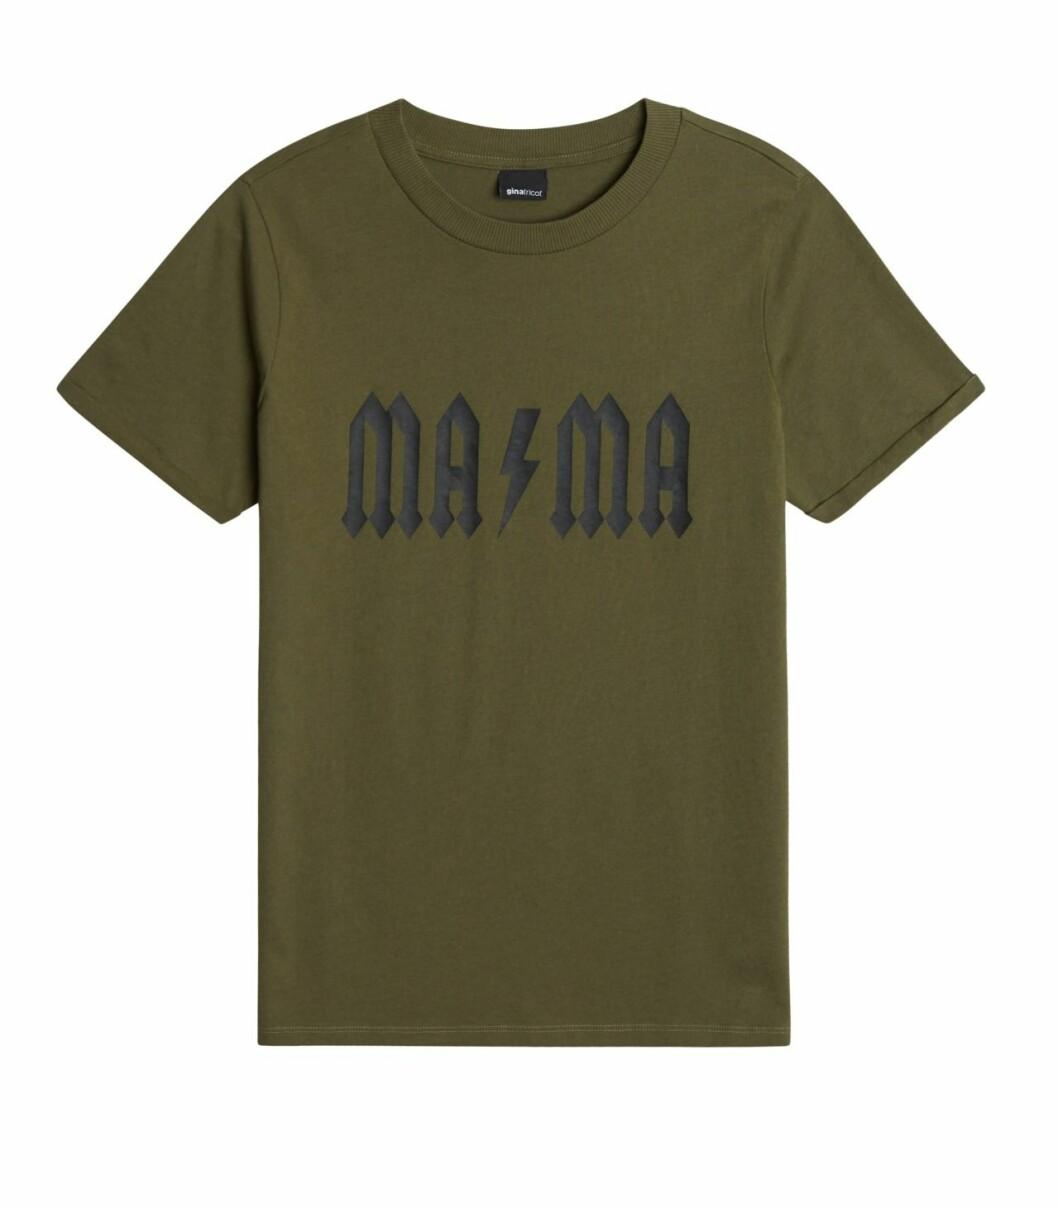 Gina tricot Mini mor- och barnkollektion –grön t-shirt